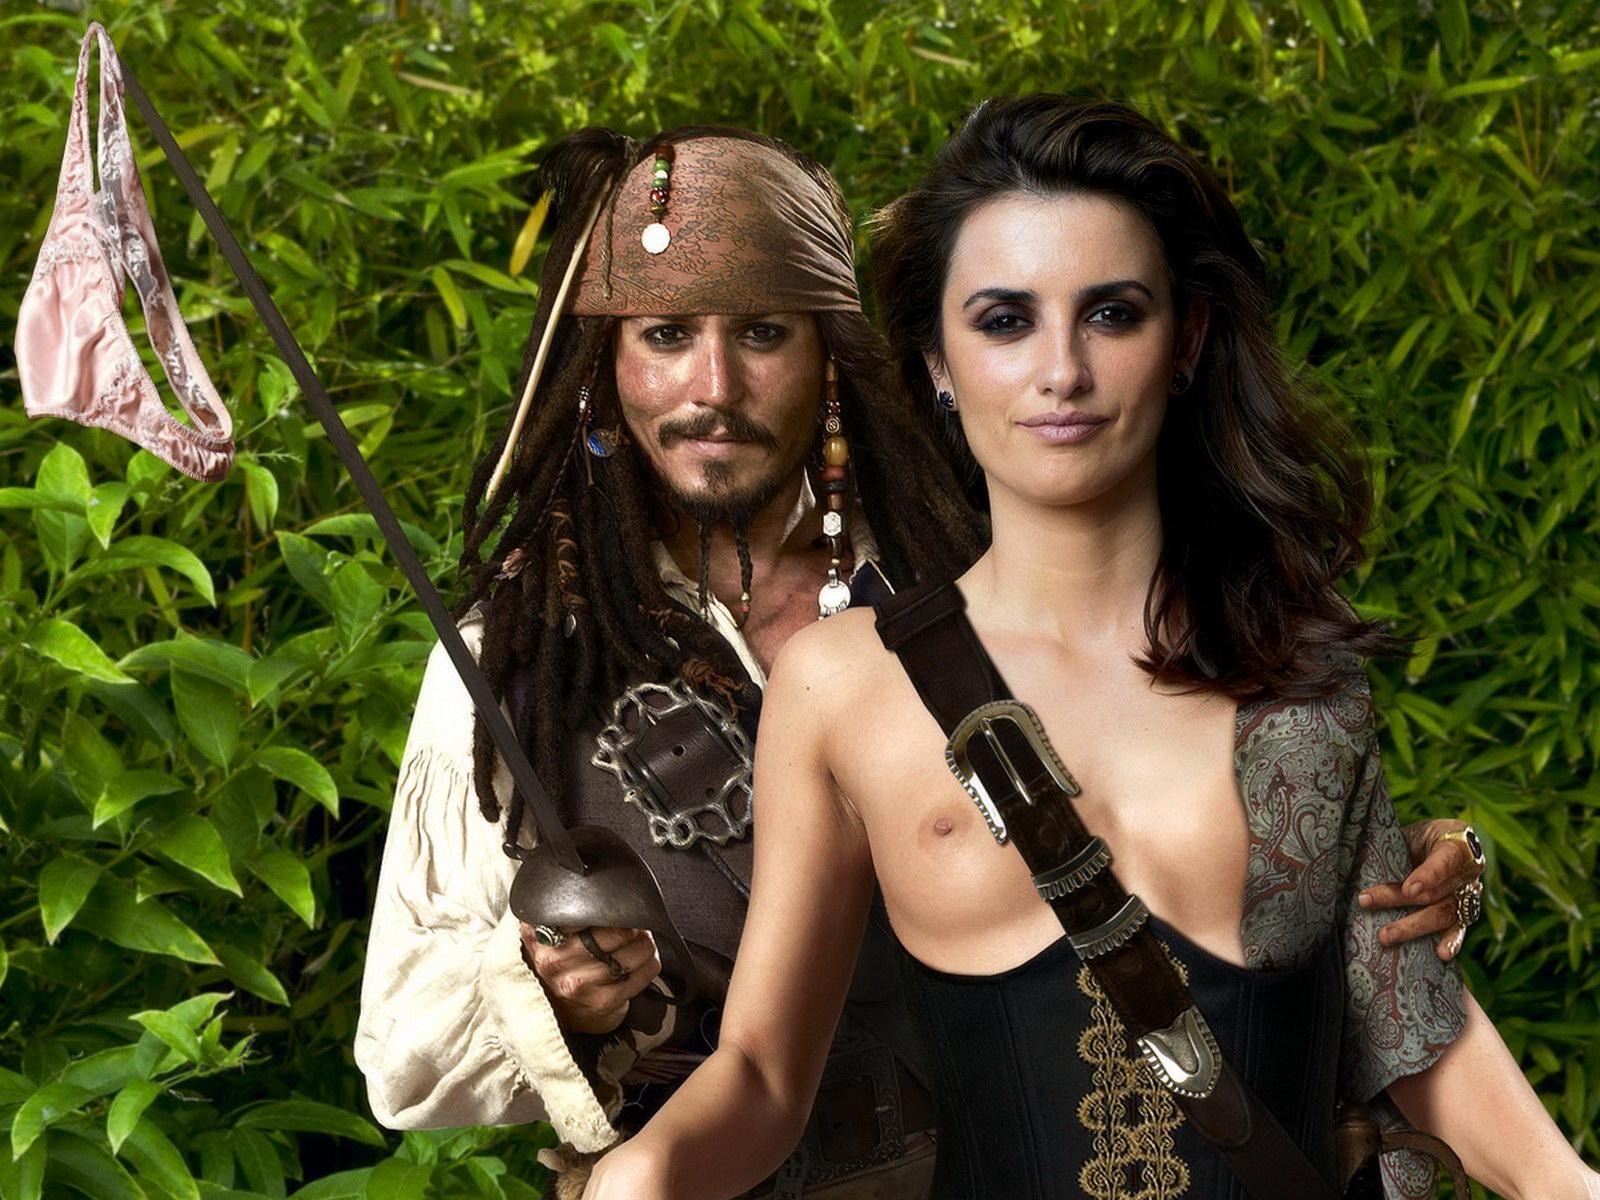 pirates of the caribbean porno